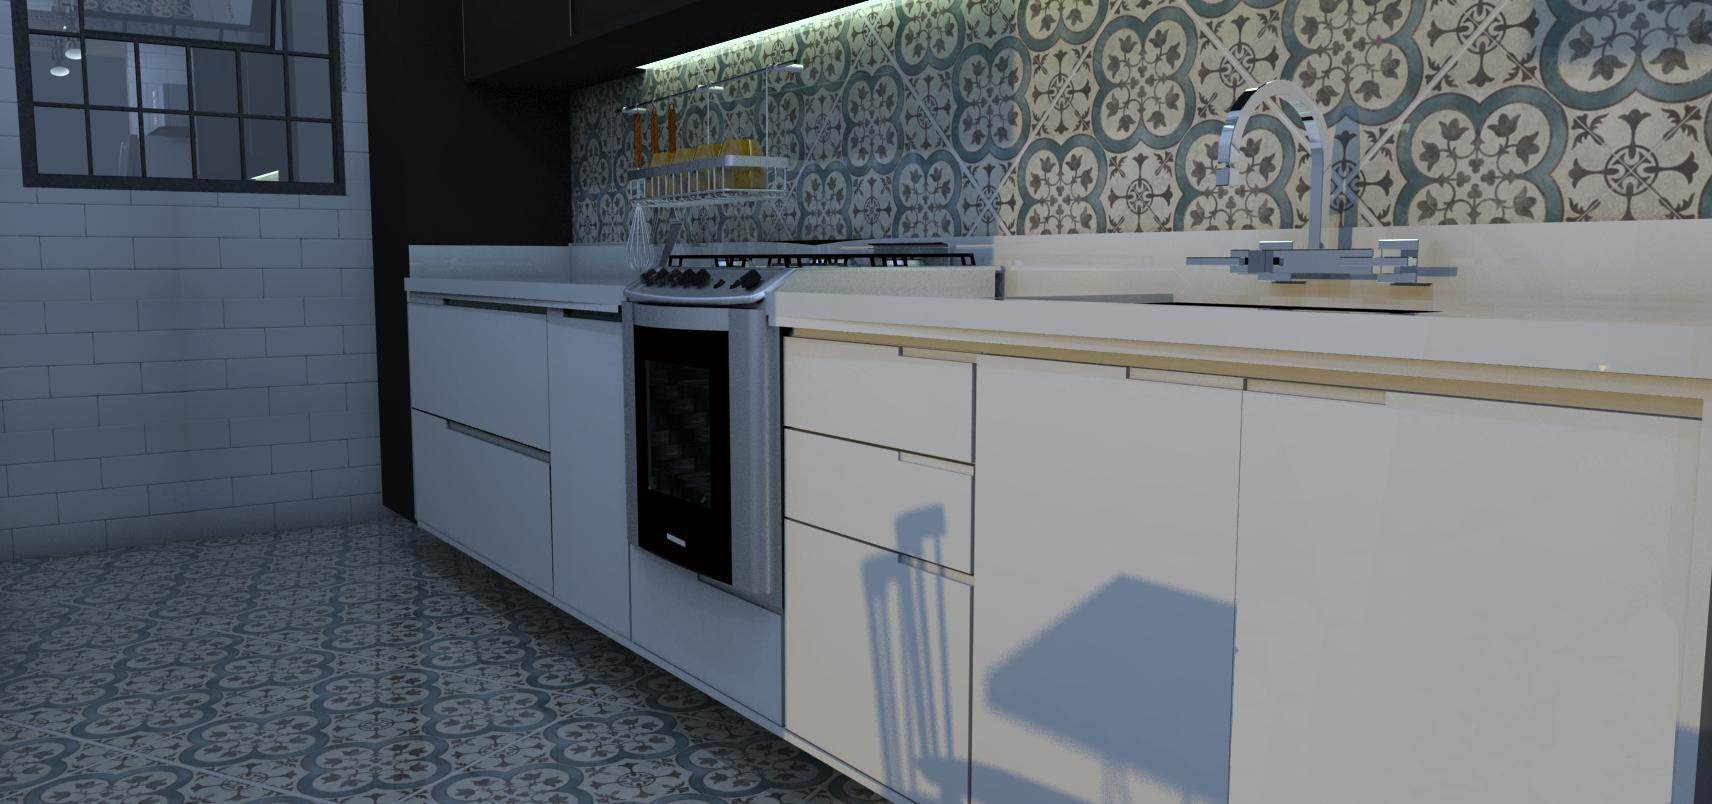 cozinha estilo industrial Designer de interiores em Curitiba Murilo #527967 1712 804